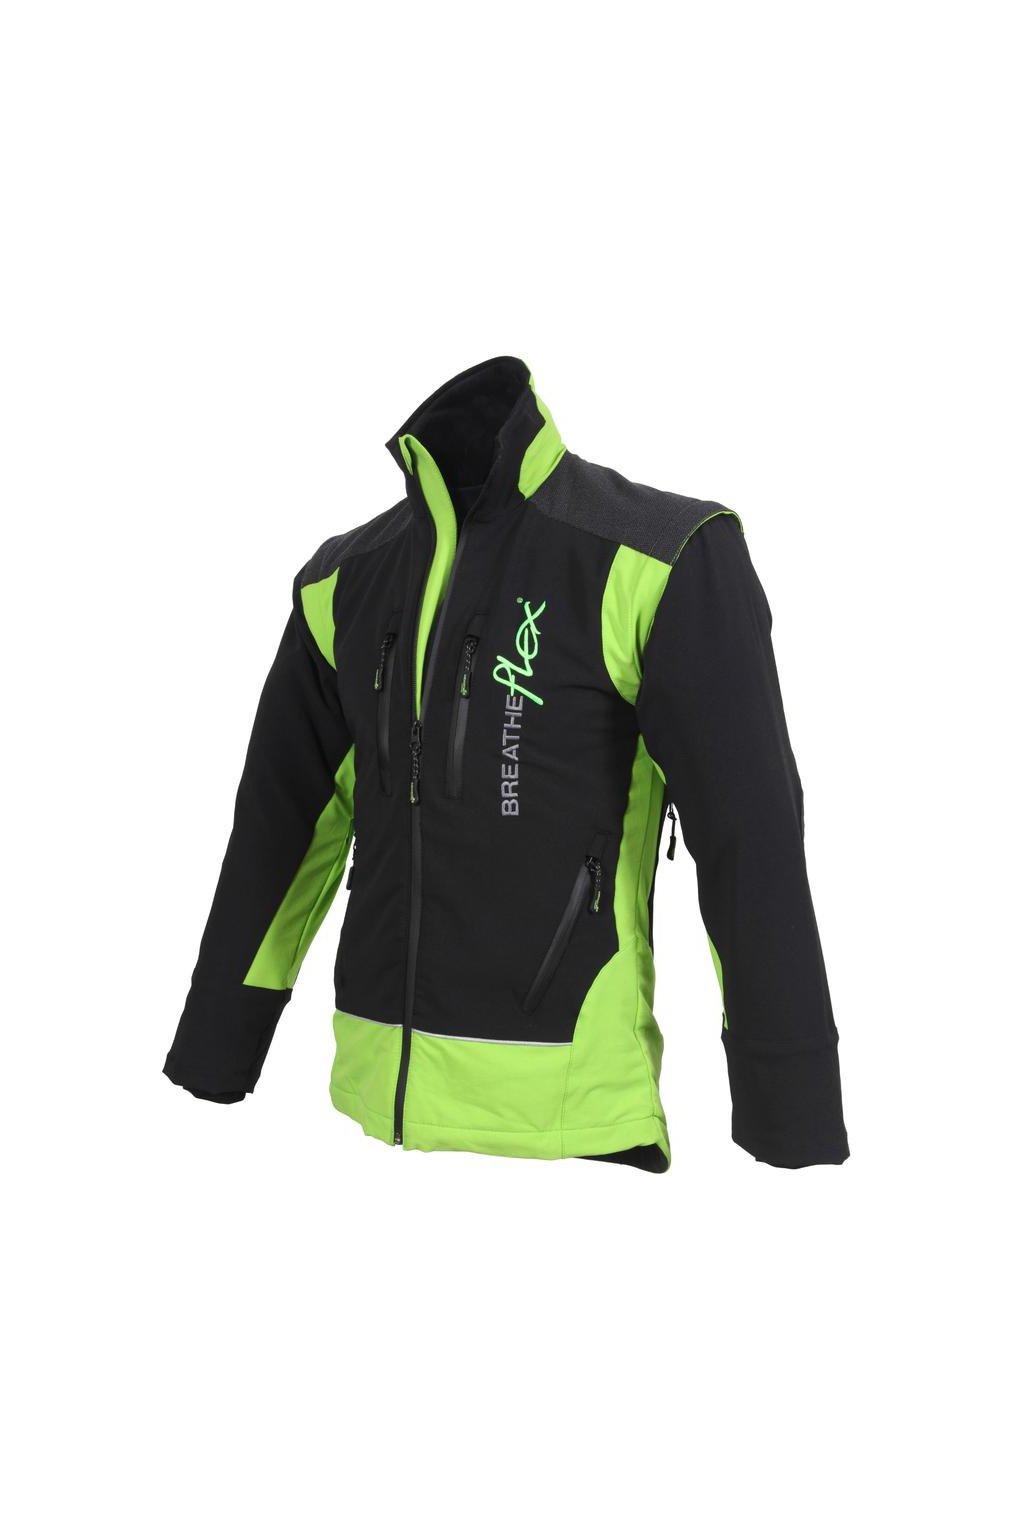 at4000 breatheflex jacket 1 1 c6e9c1b9 bd99 454d 912c fff0c5645d9d 720x